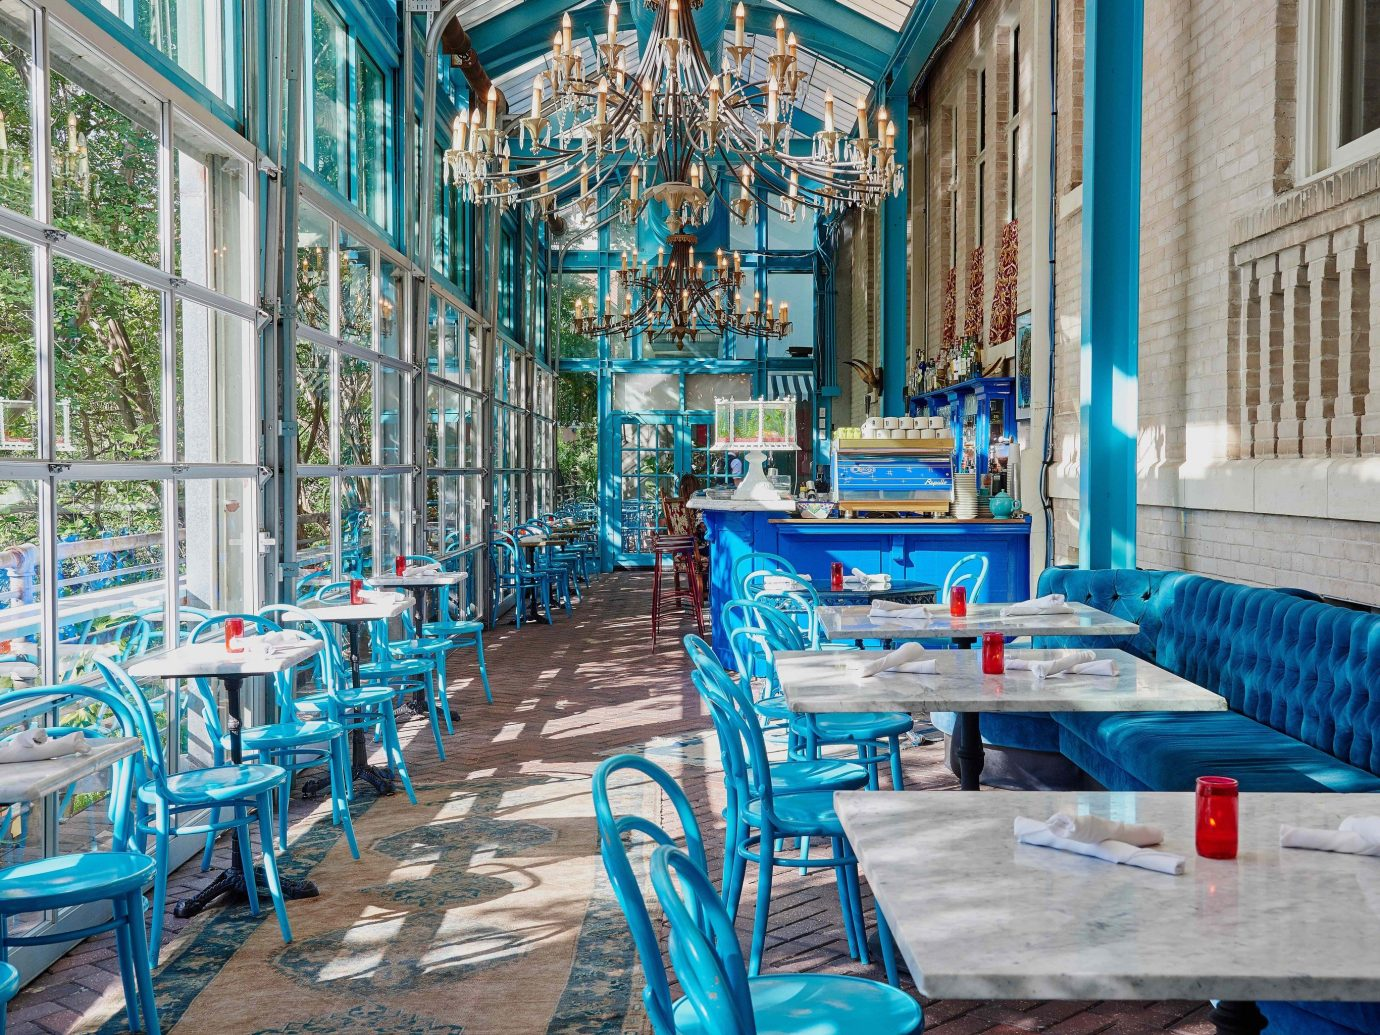 Budget building color ground outdoor blue chair estate home Resort interior design restaurant